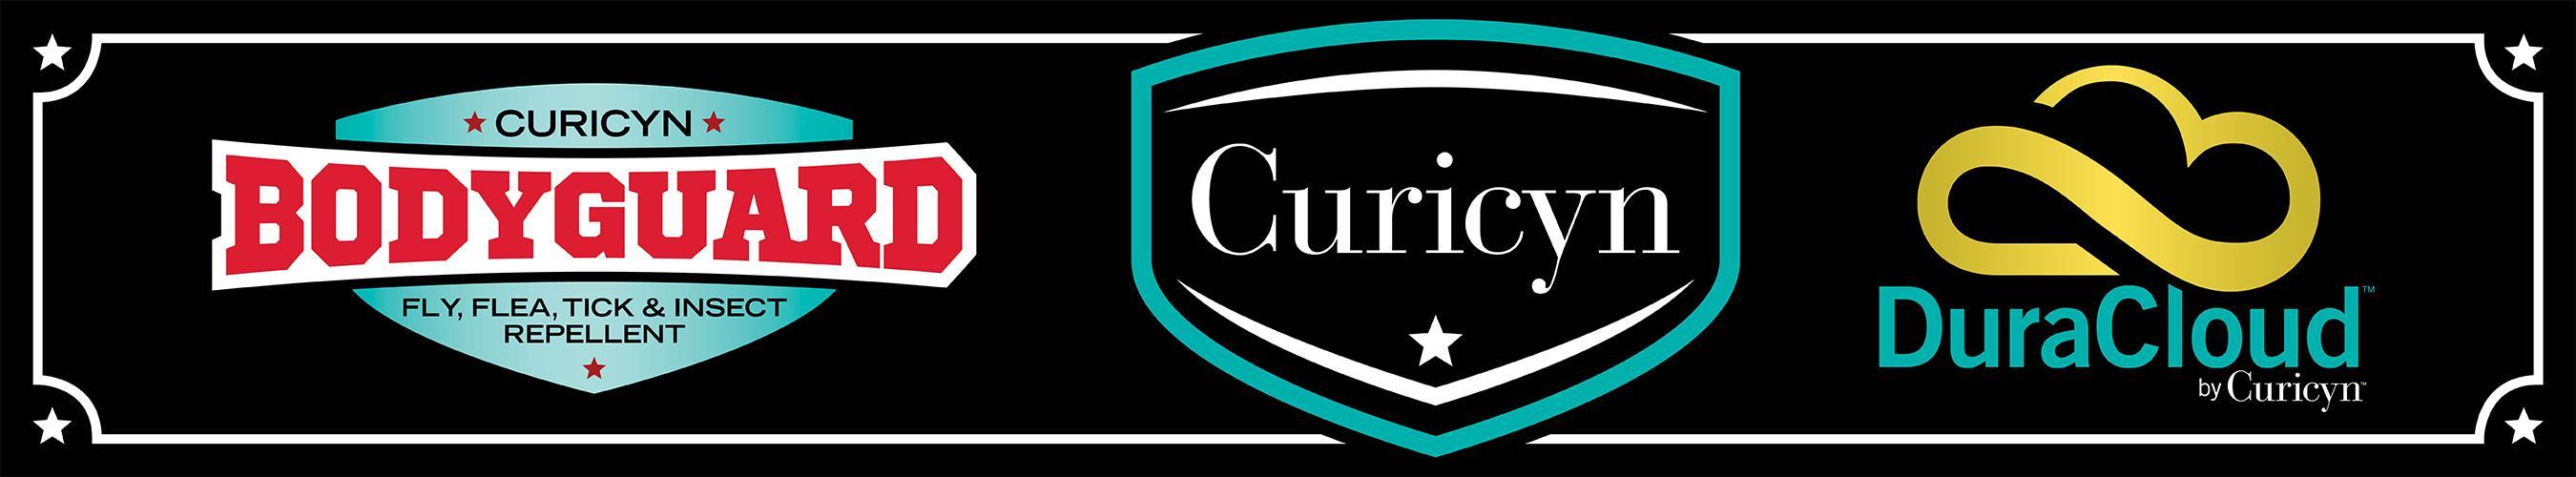 Curicyn™